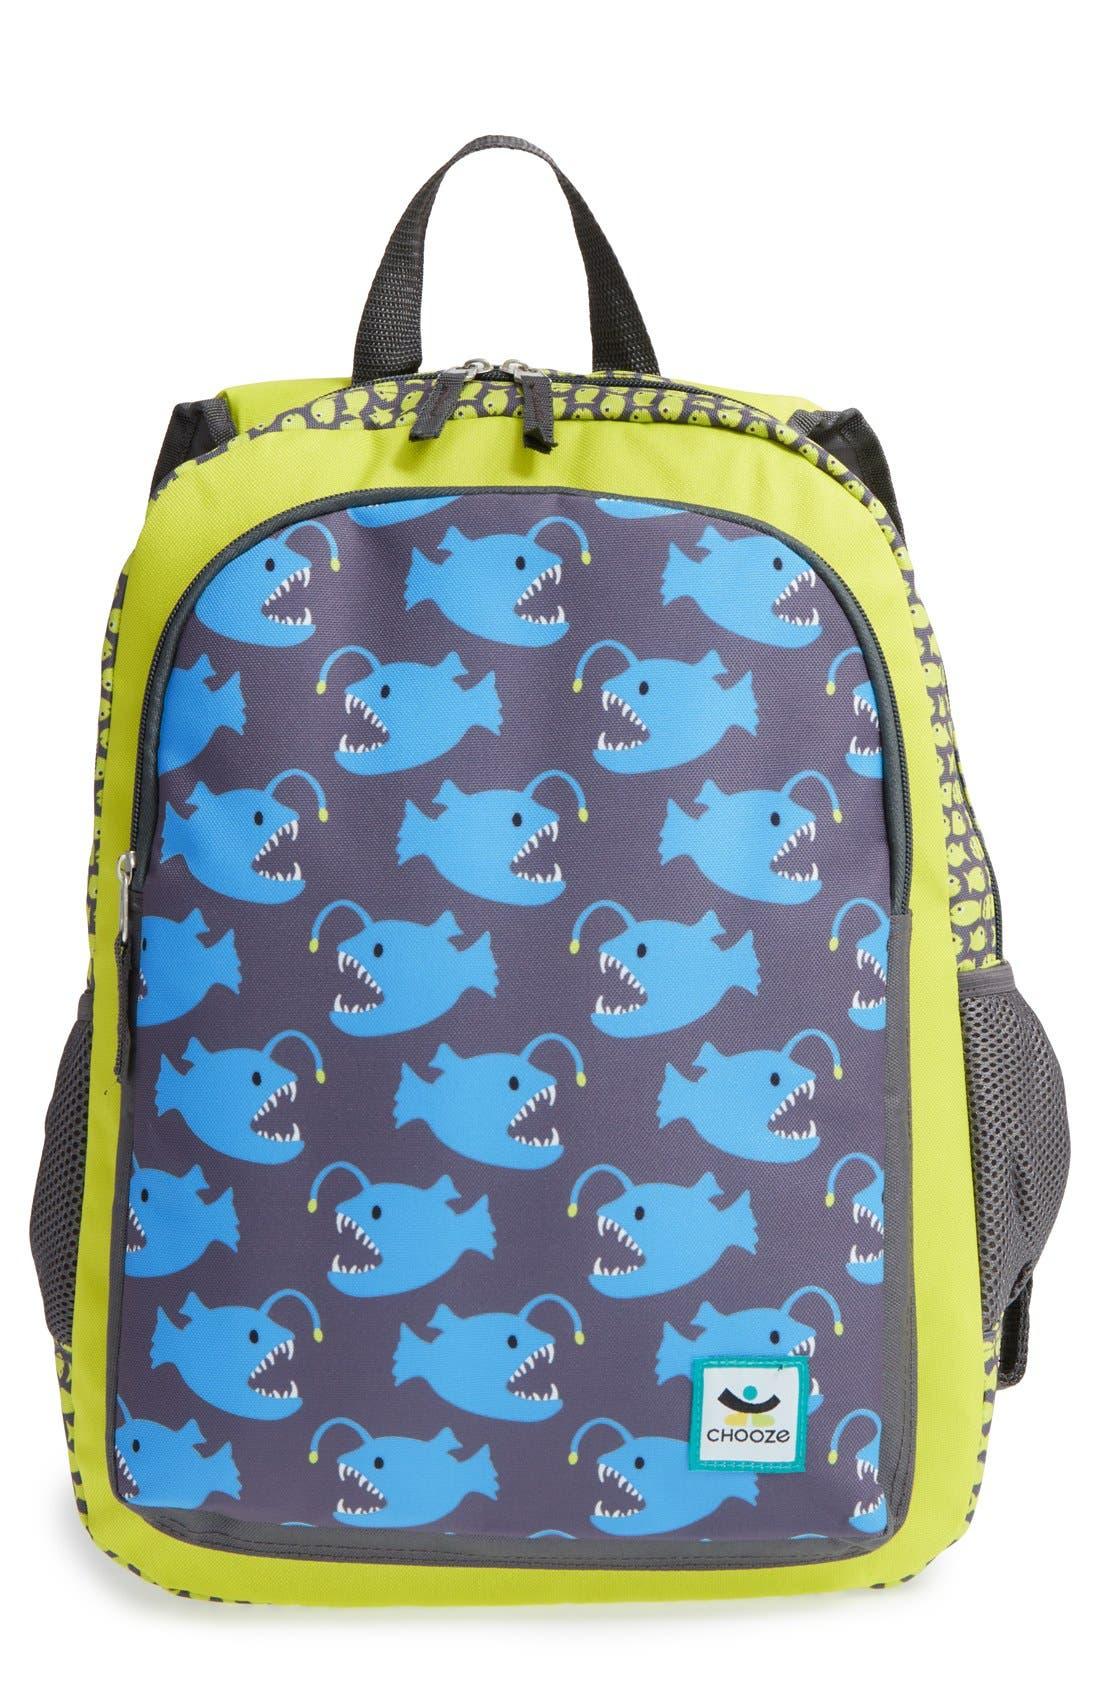 Reversible Backpack,                             Main thumbnail 1, color,                             452